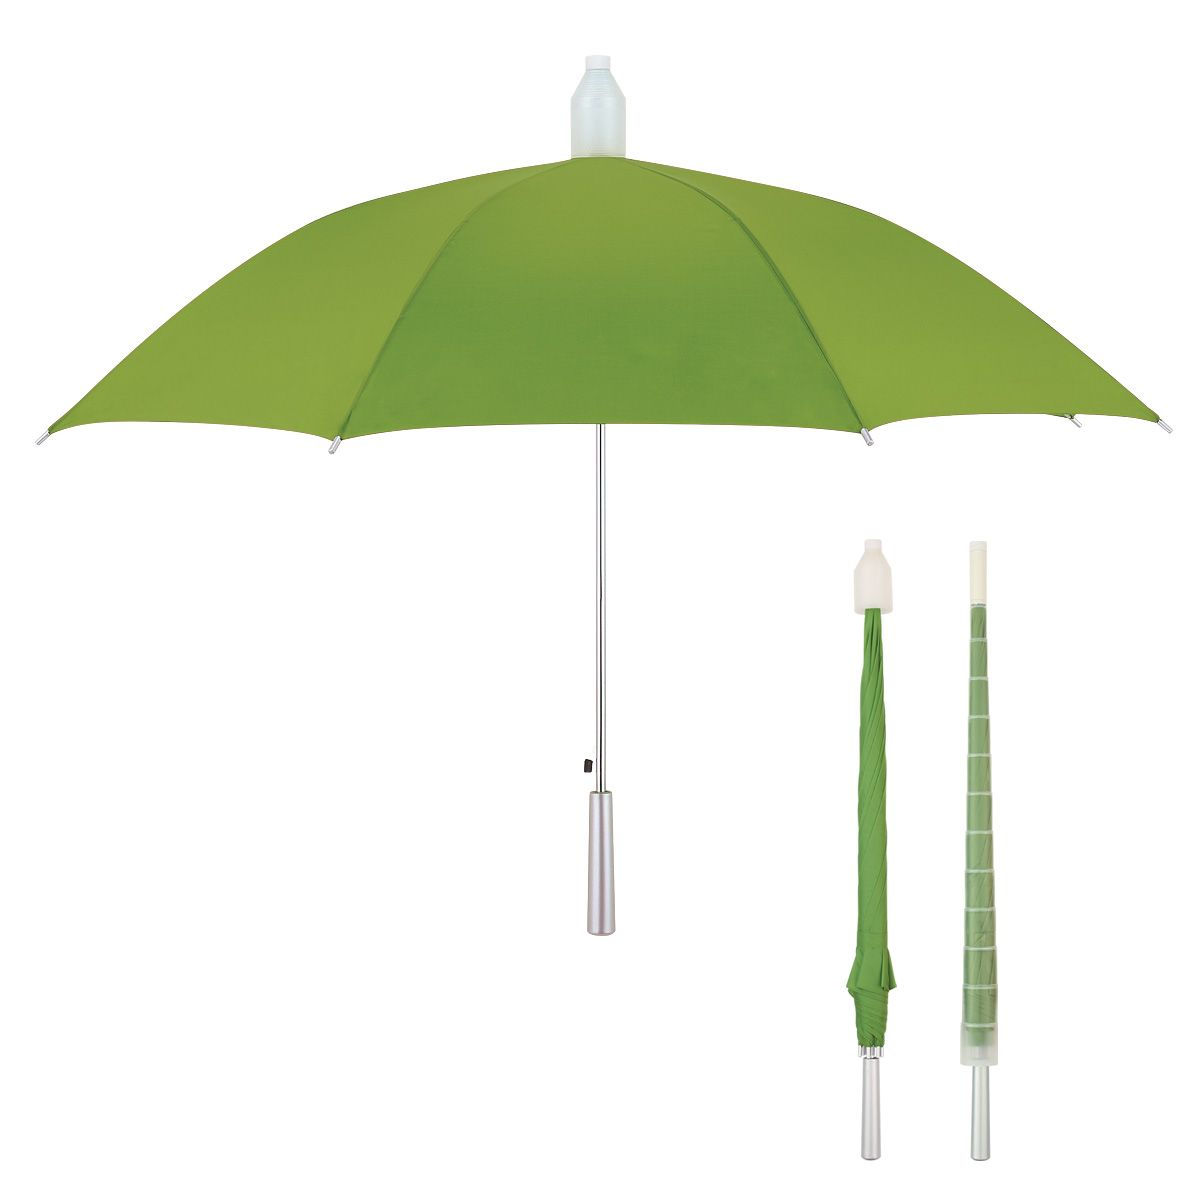 Pin by Roham International, Inc. on Umbrellas   Pinterest